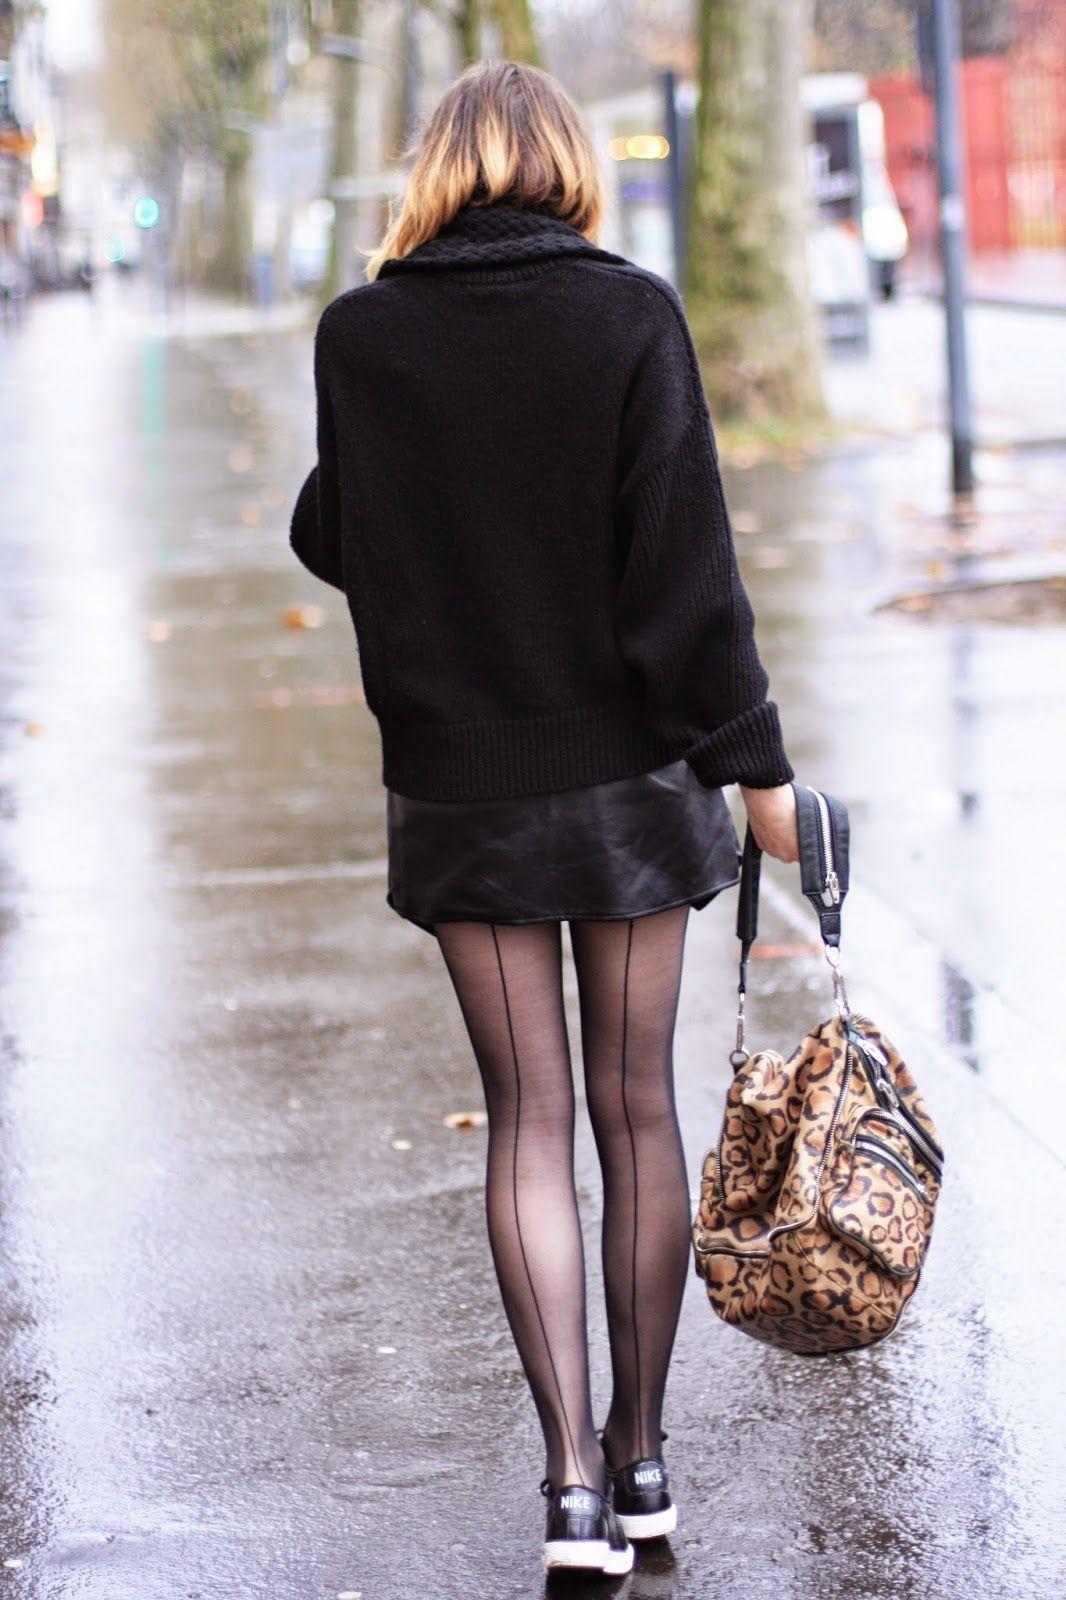 Les collants couture et moi   (made in)Faro   Blog mode Lille, blog beauté,  blog voyage et lifestyle 51ab814c2f91